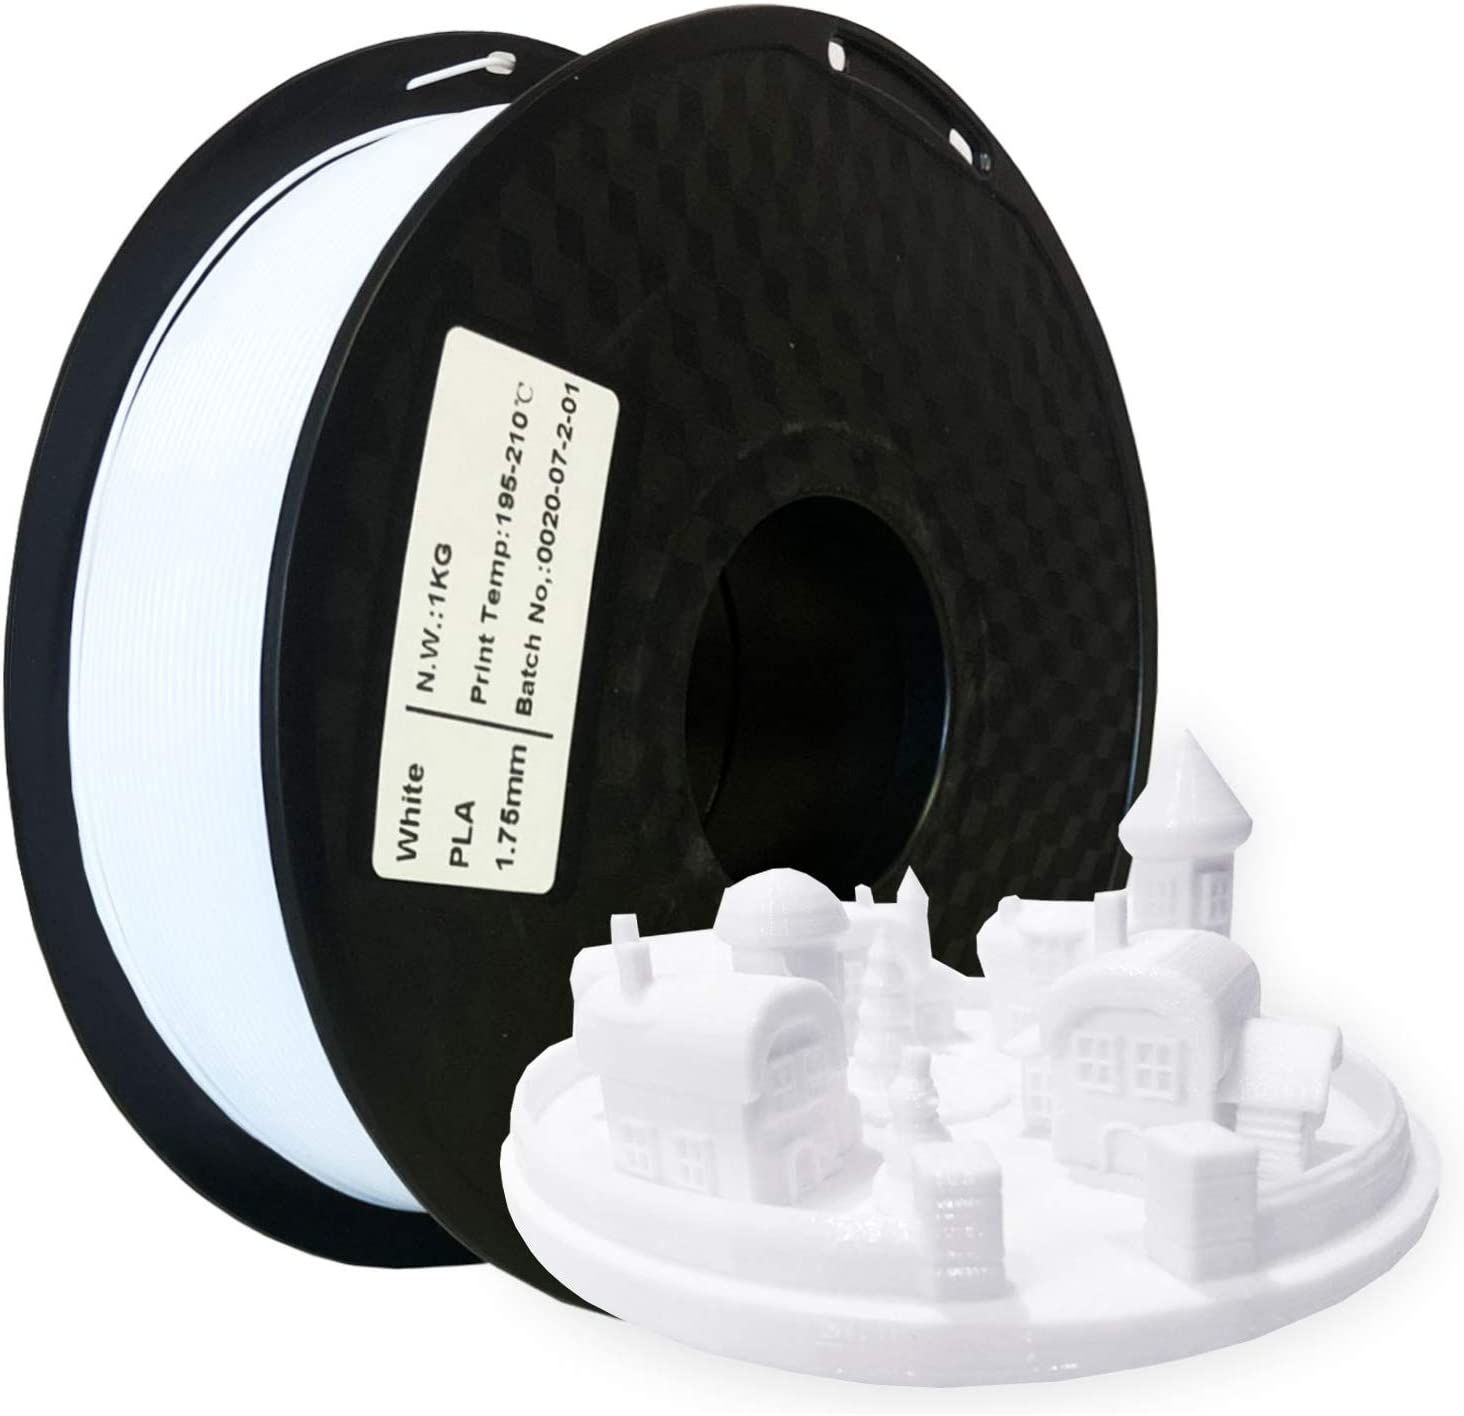 SUPPLY3D PLA 1KG 1.75 White PLA 3D Print Filament, Dimensional Accuracy +/- 0.05 MM, 1 KG Spool, 1.75 MM, White